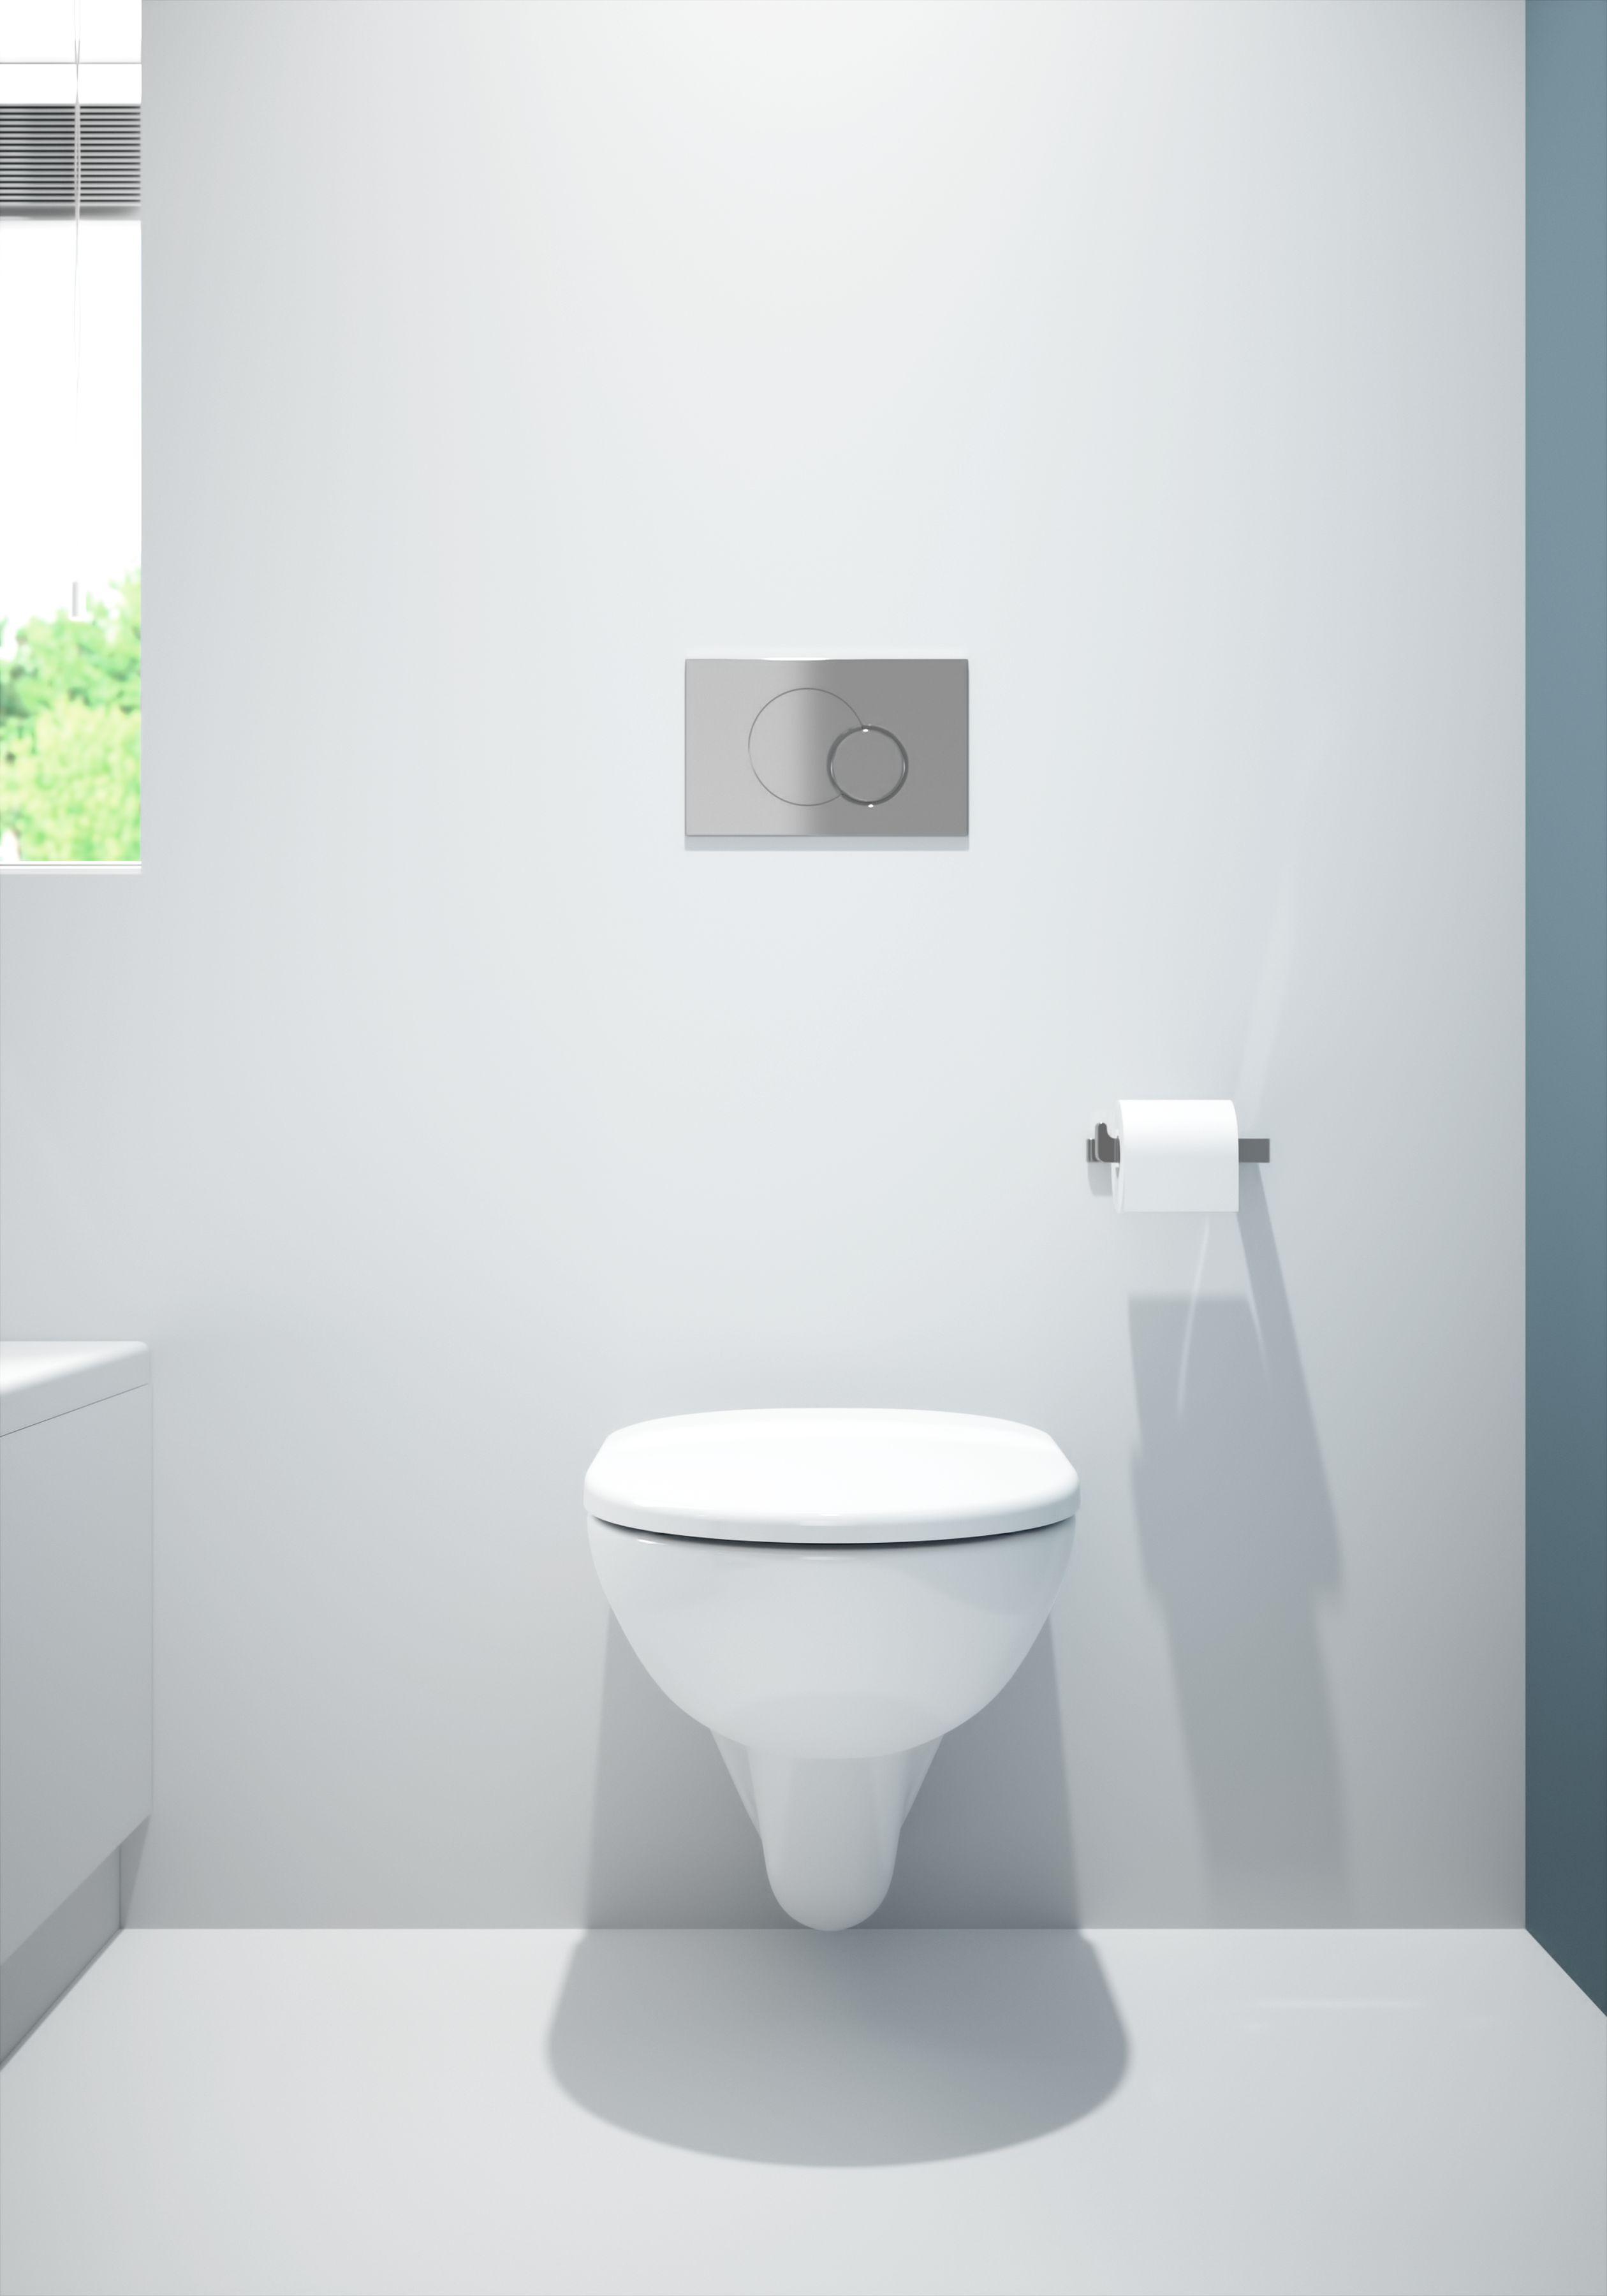 Bride De Plancher Leroy Merlin Beau Photos toilette Suspendu Geberit Avec Ides De Wc Suspendu Geberit Osmose